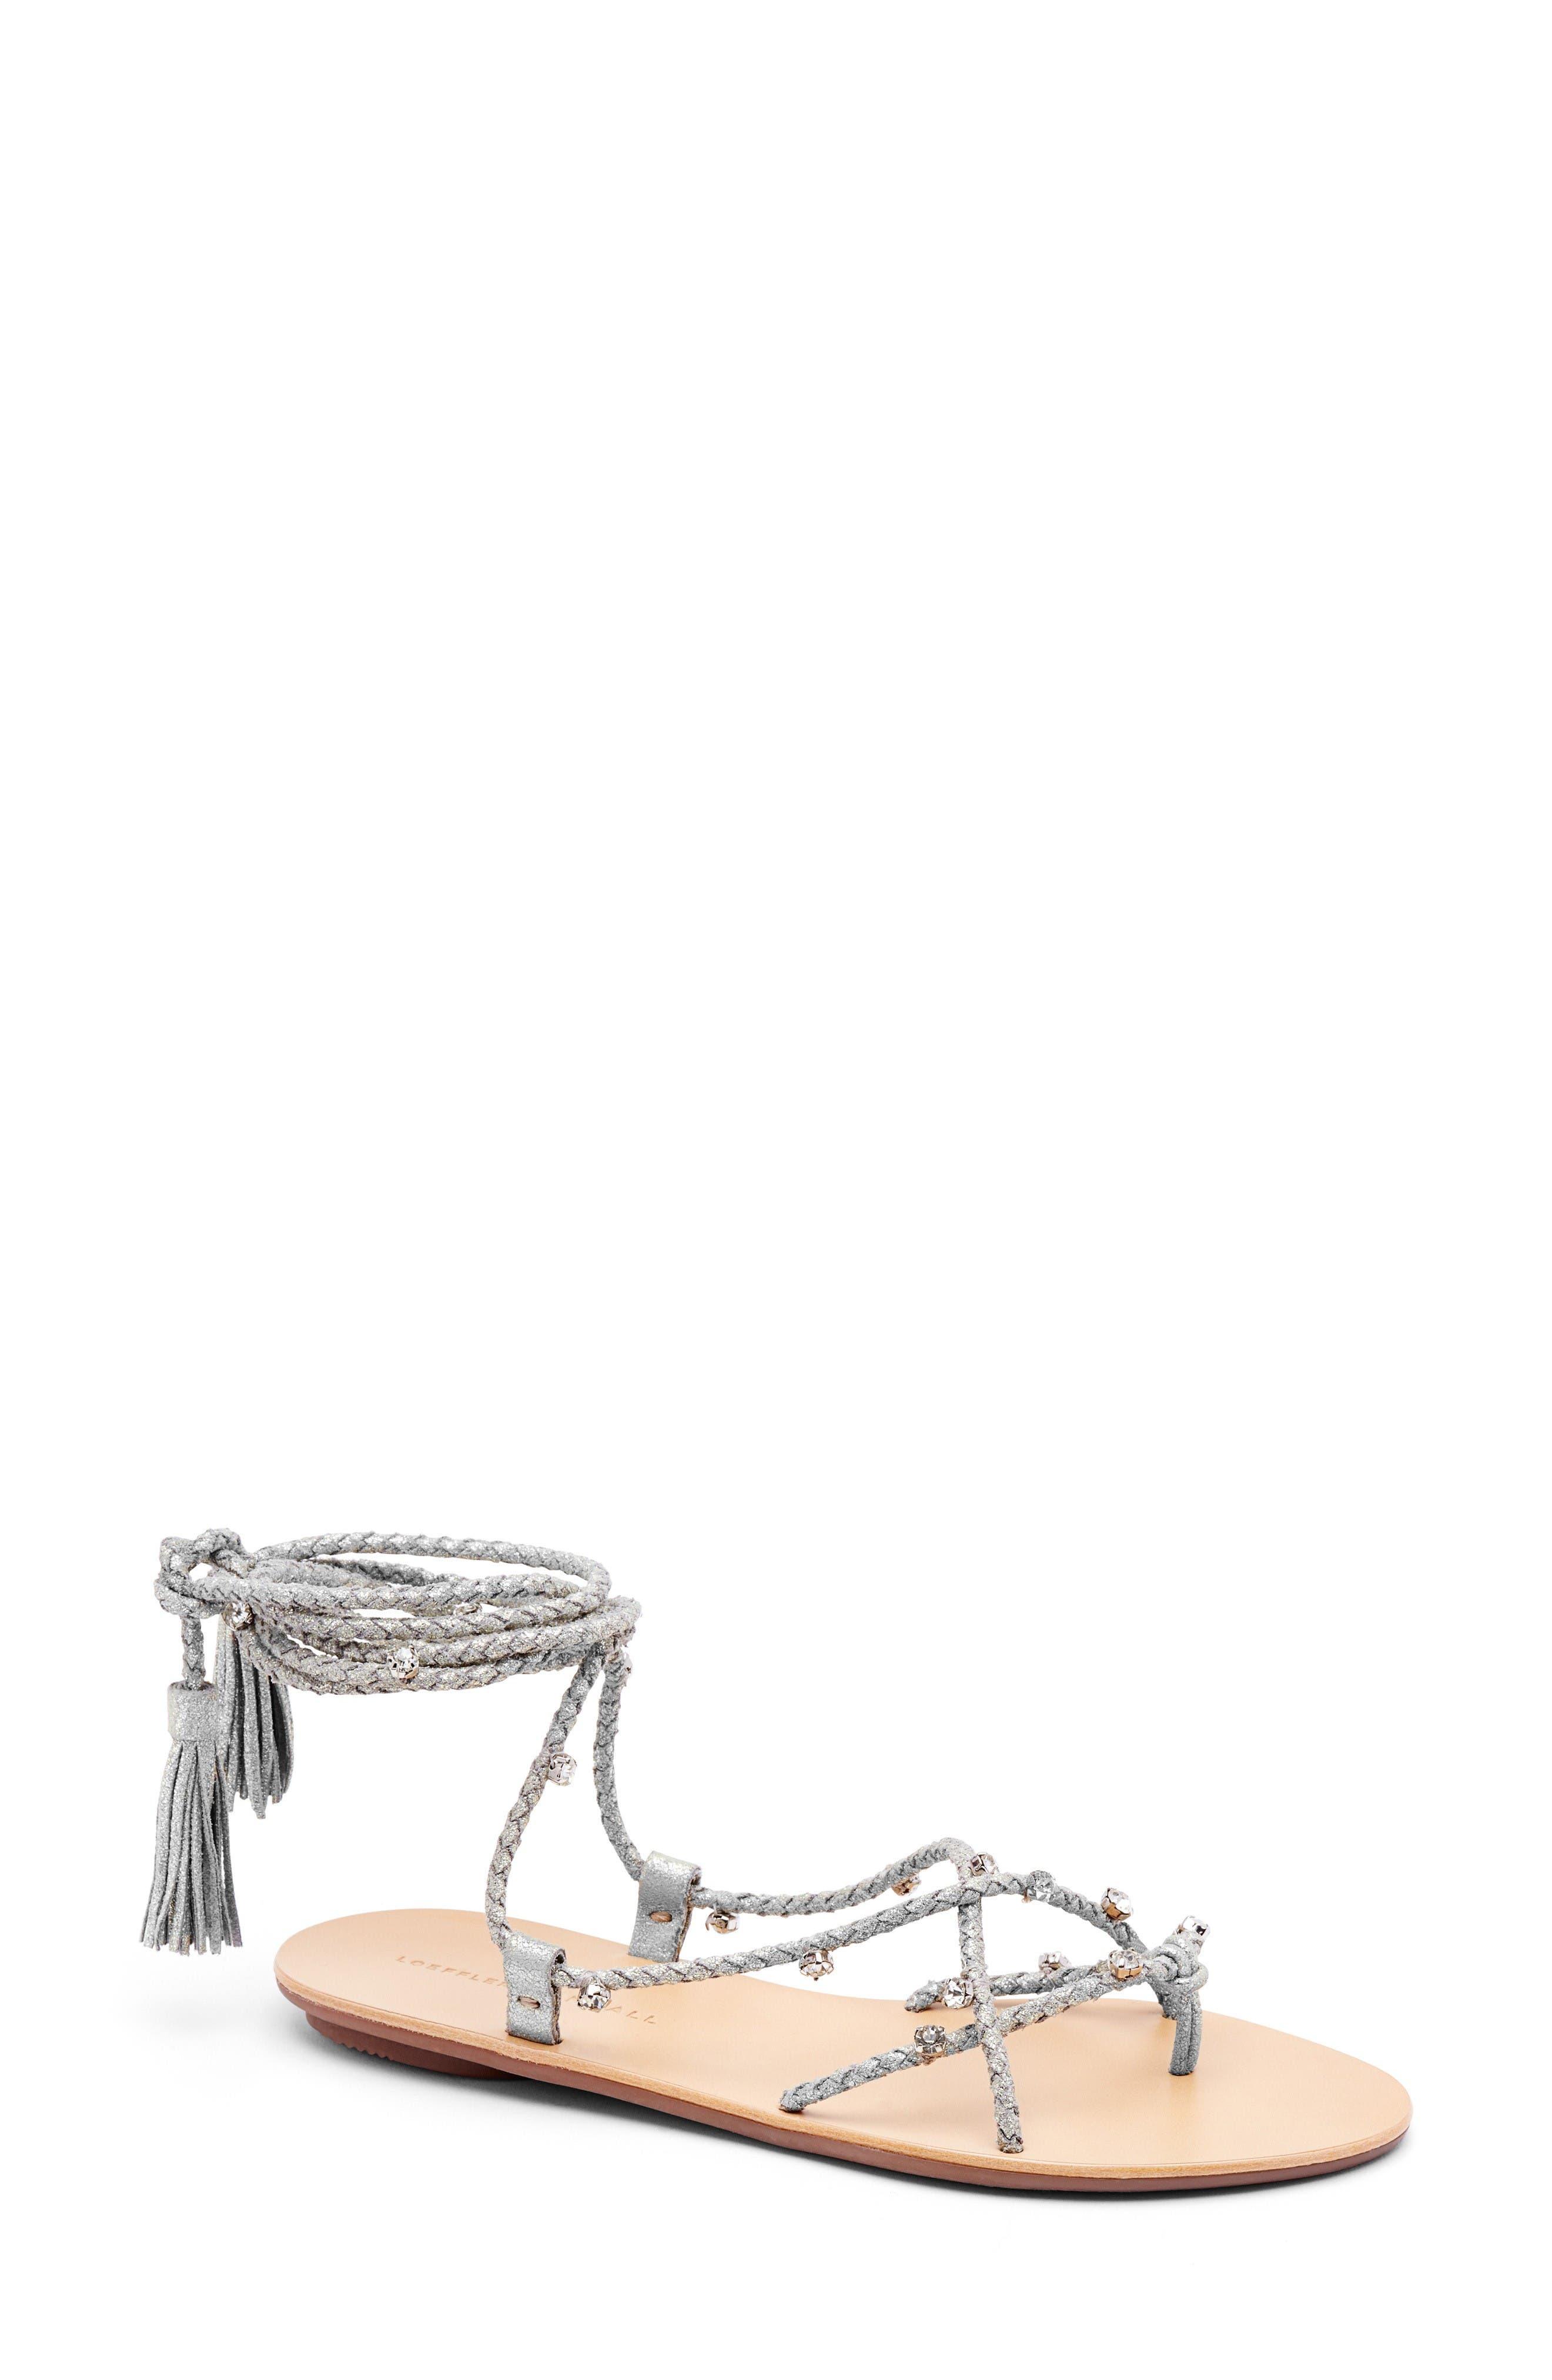 Bo Ankle Wrap Sandal,                         Main,                         color, Silver